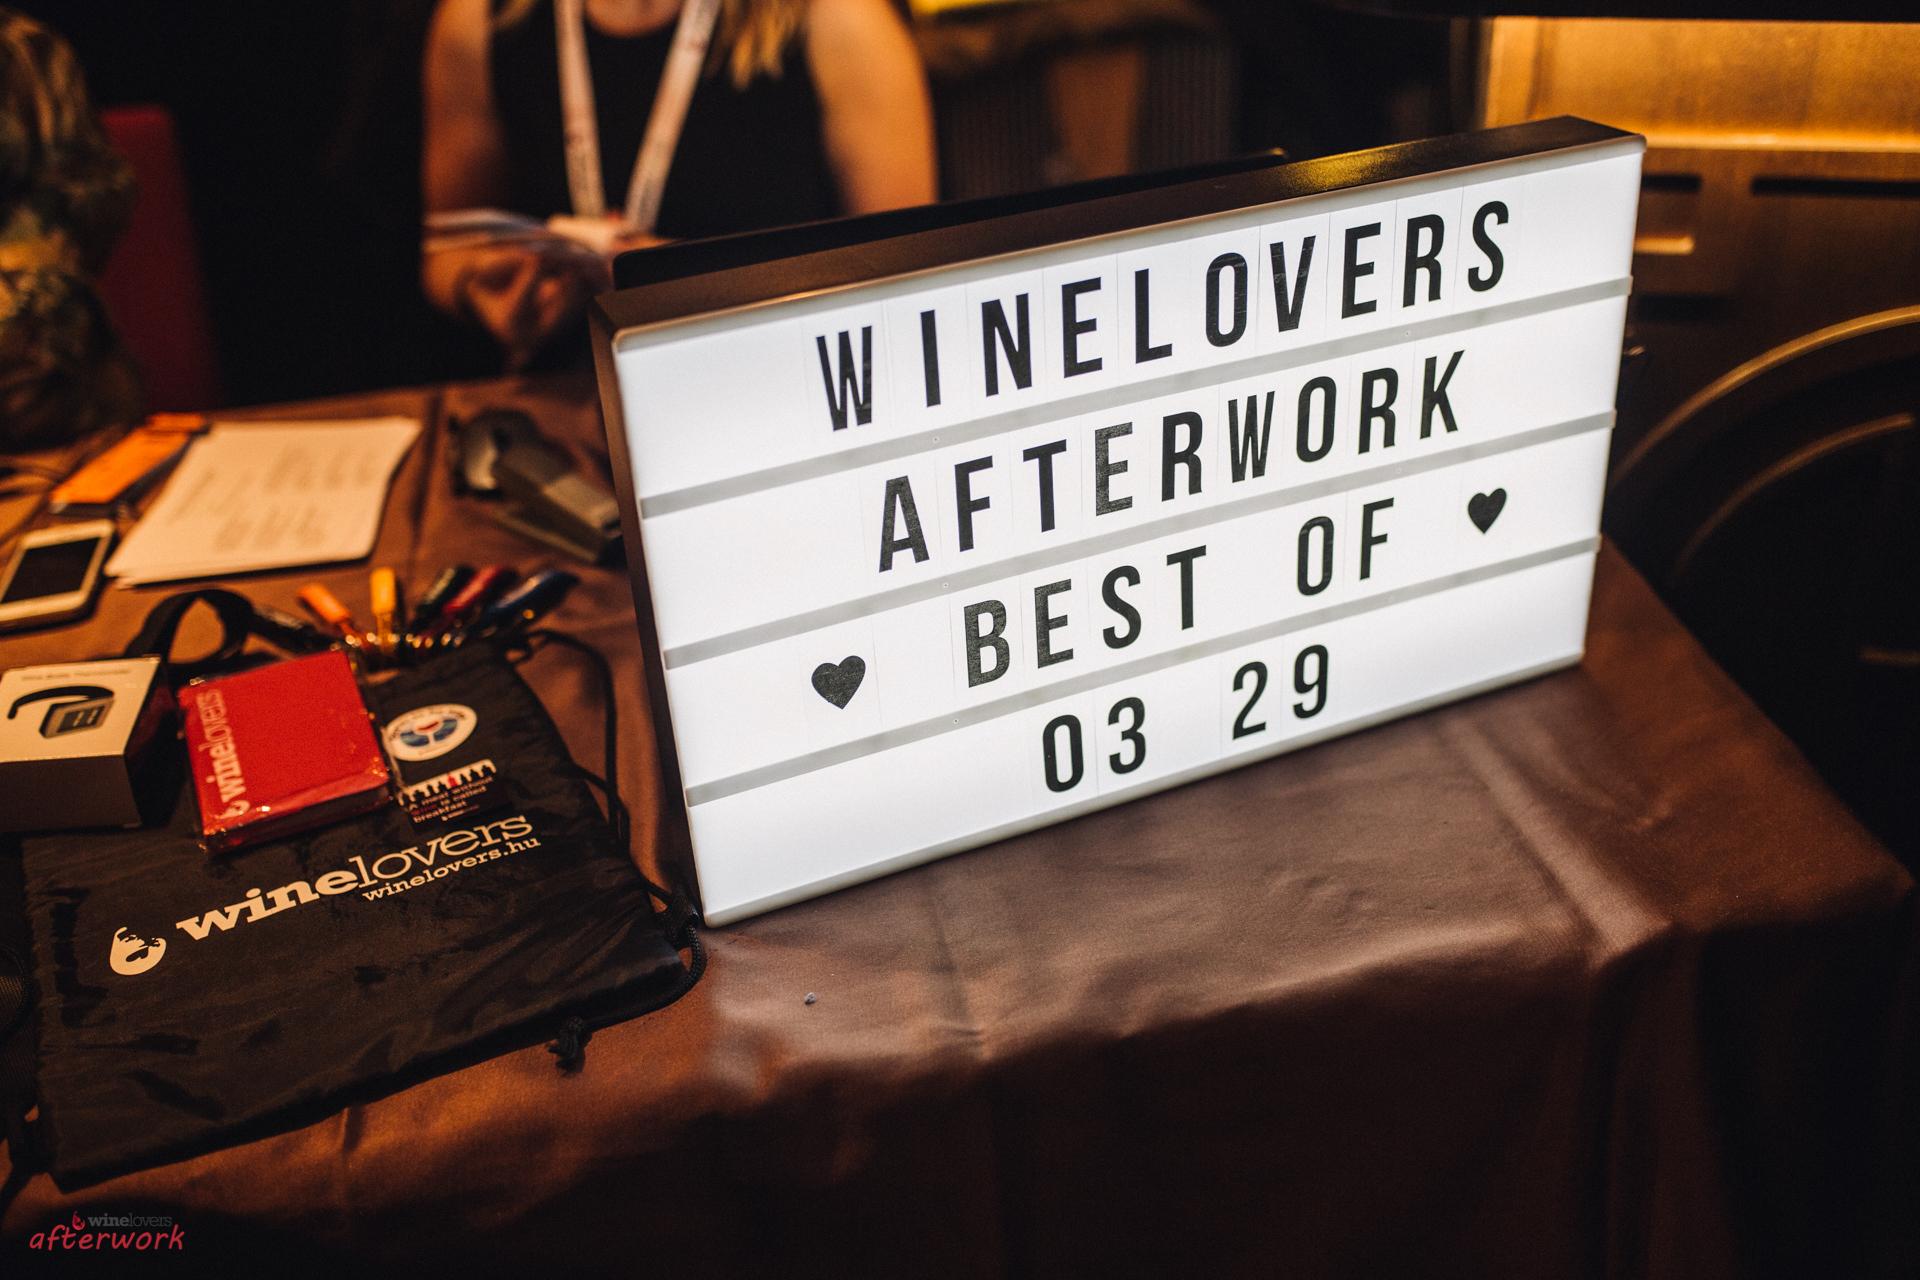 winelovers_afterwork_best_of-20180329-4351.jpg